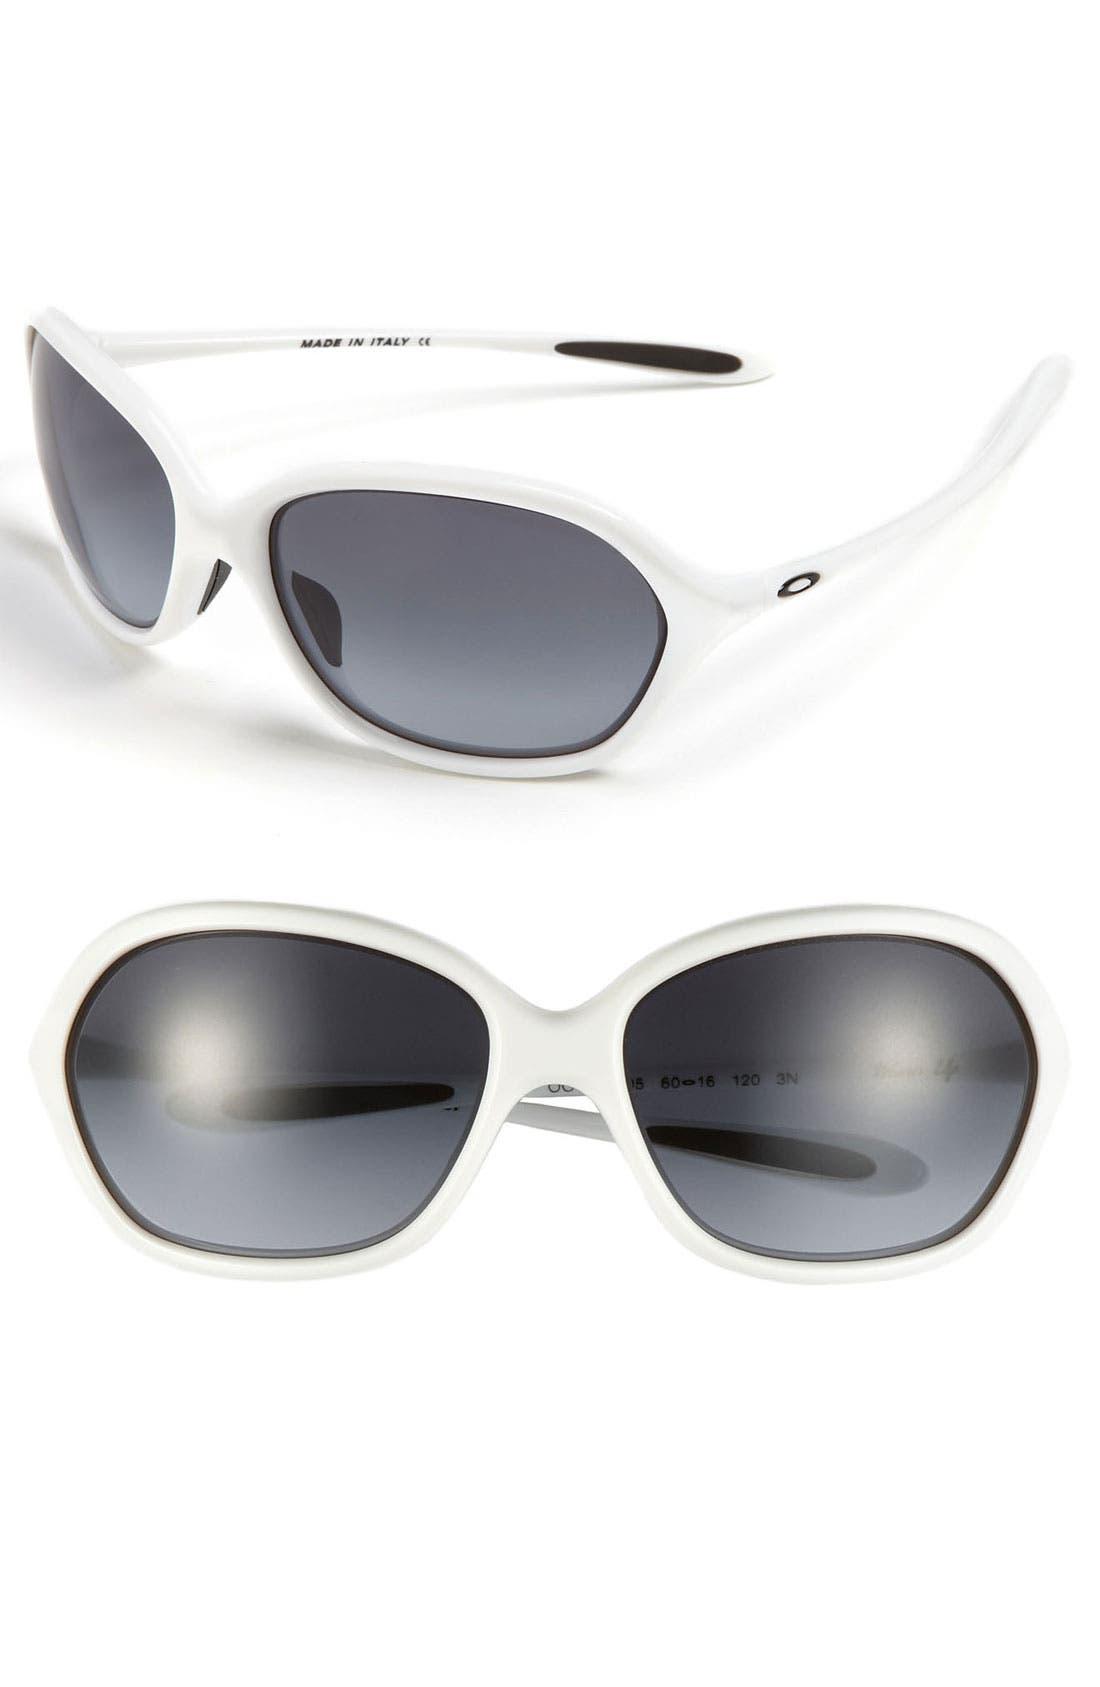 Alternate Image 1 Selected - Oakley 'Warm Up' 60mm Sunglasses